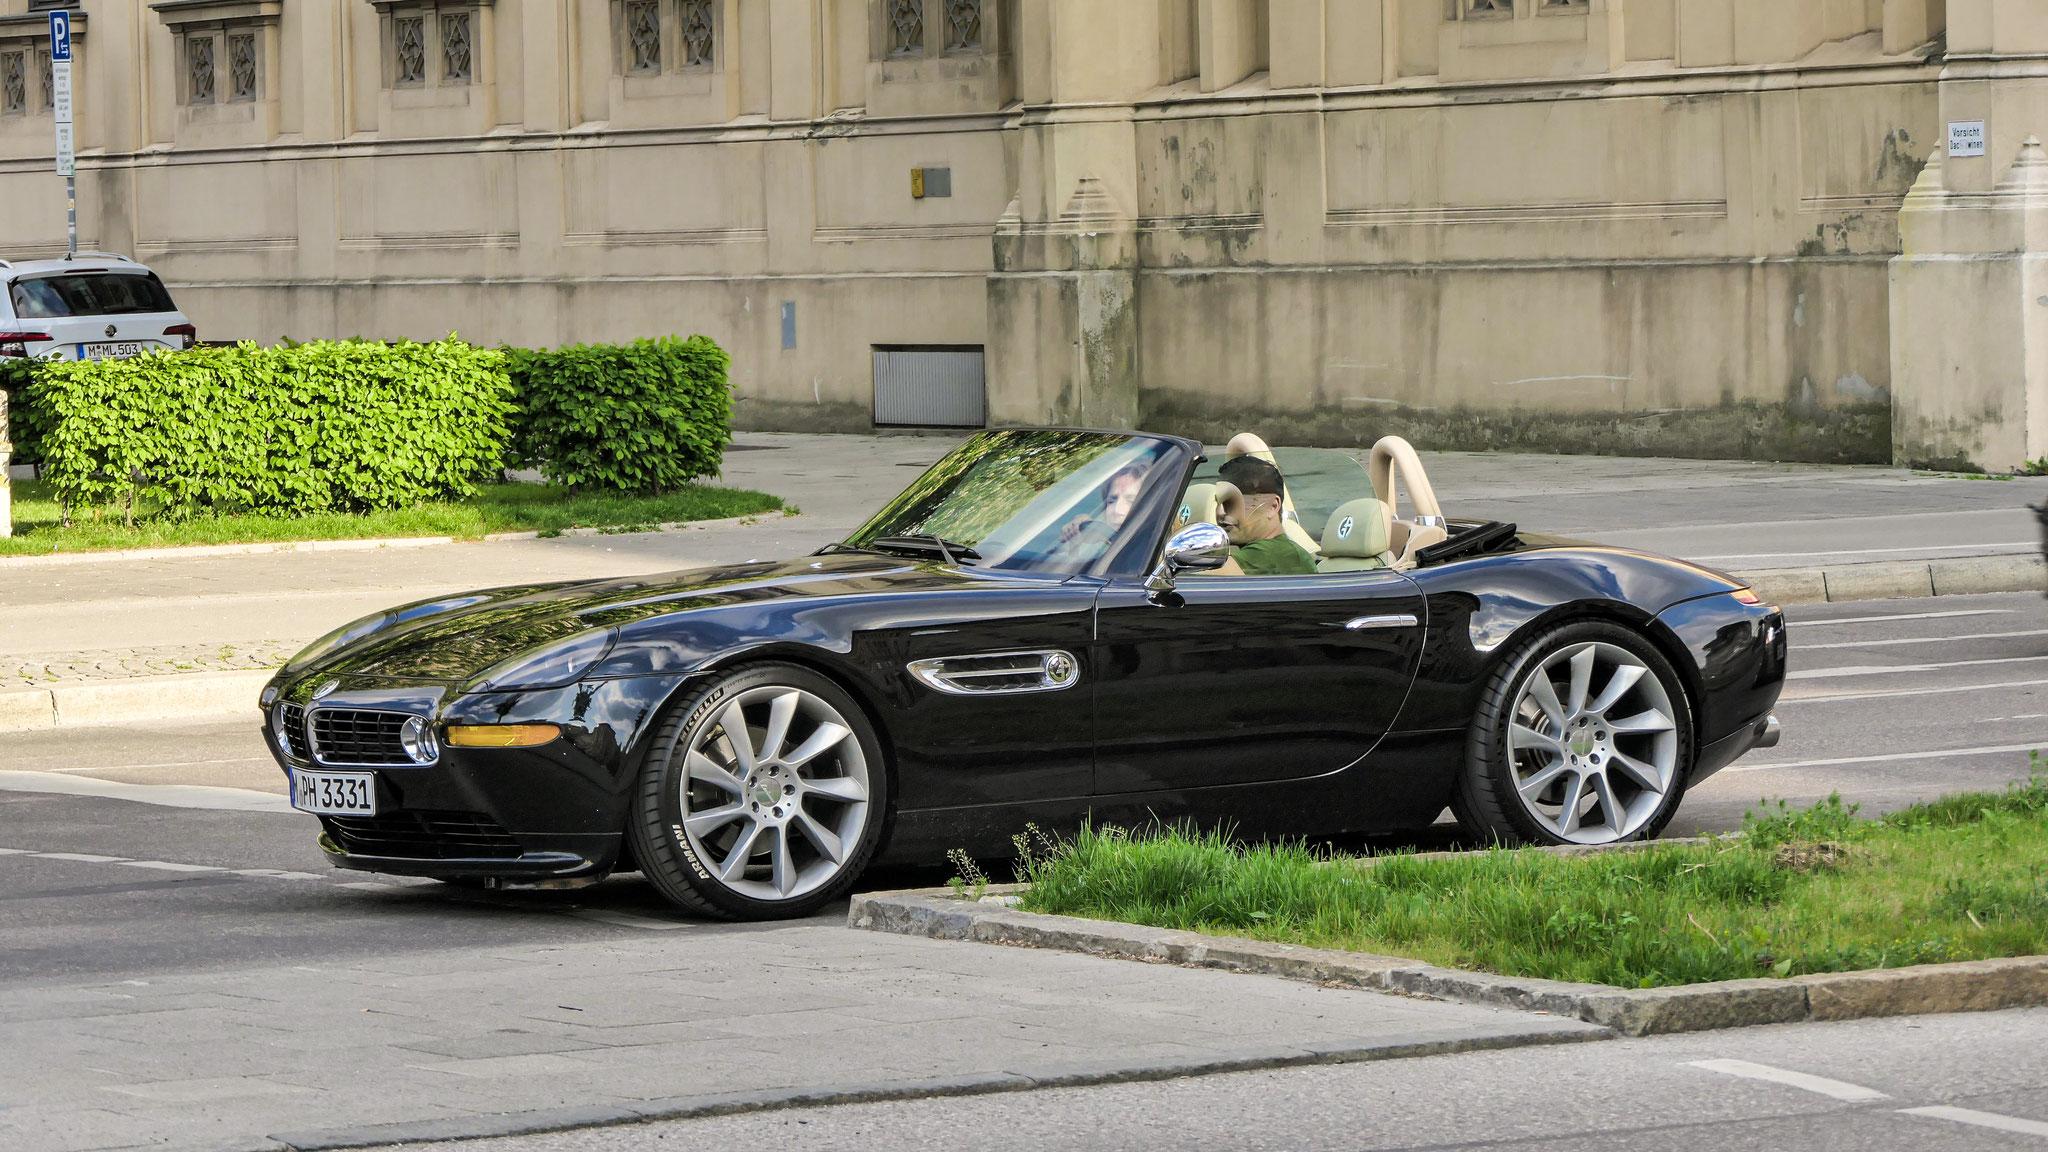 BMW Z8 - M-PH-3331